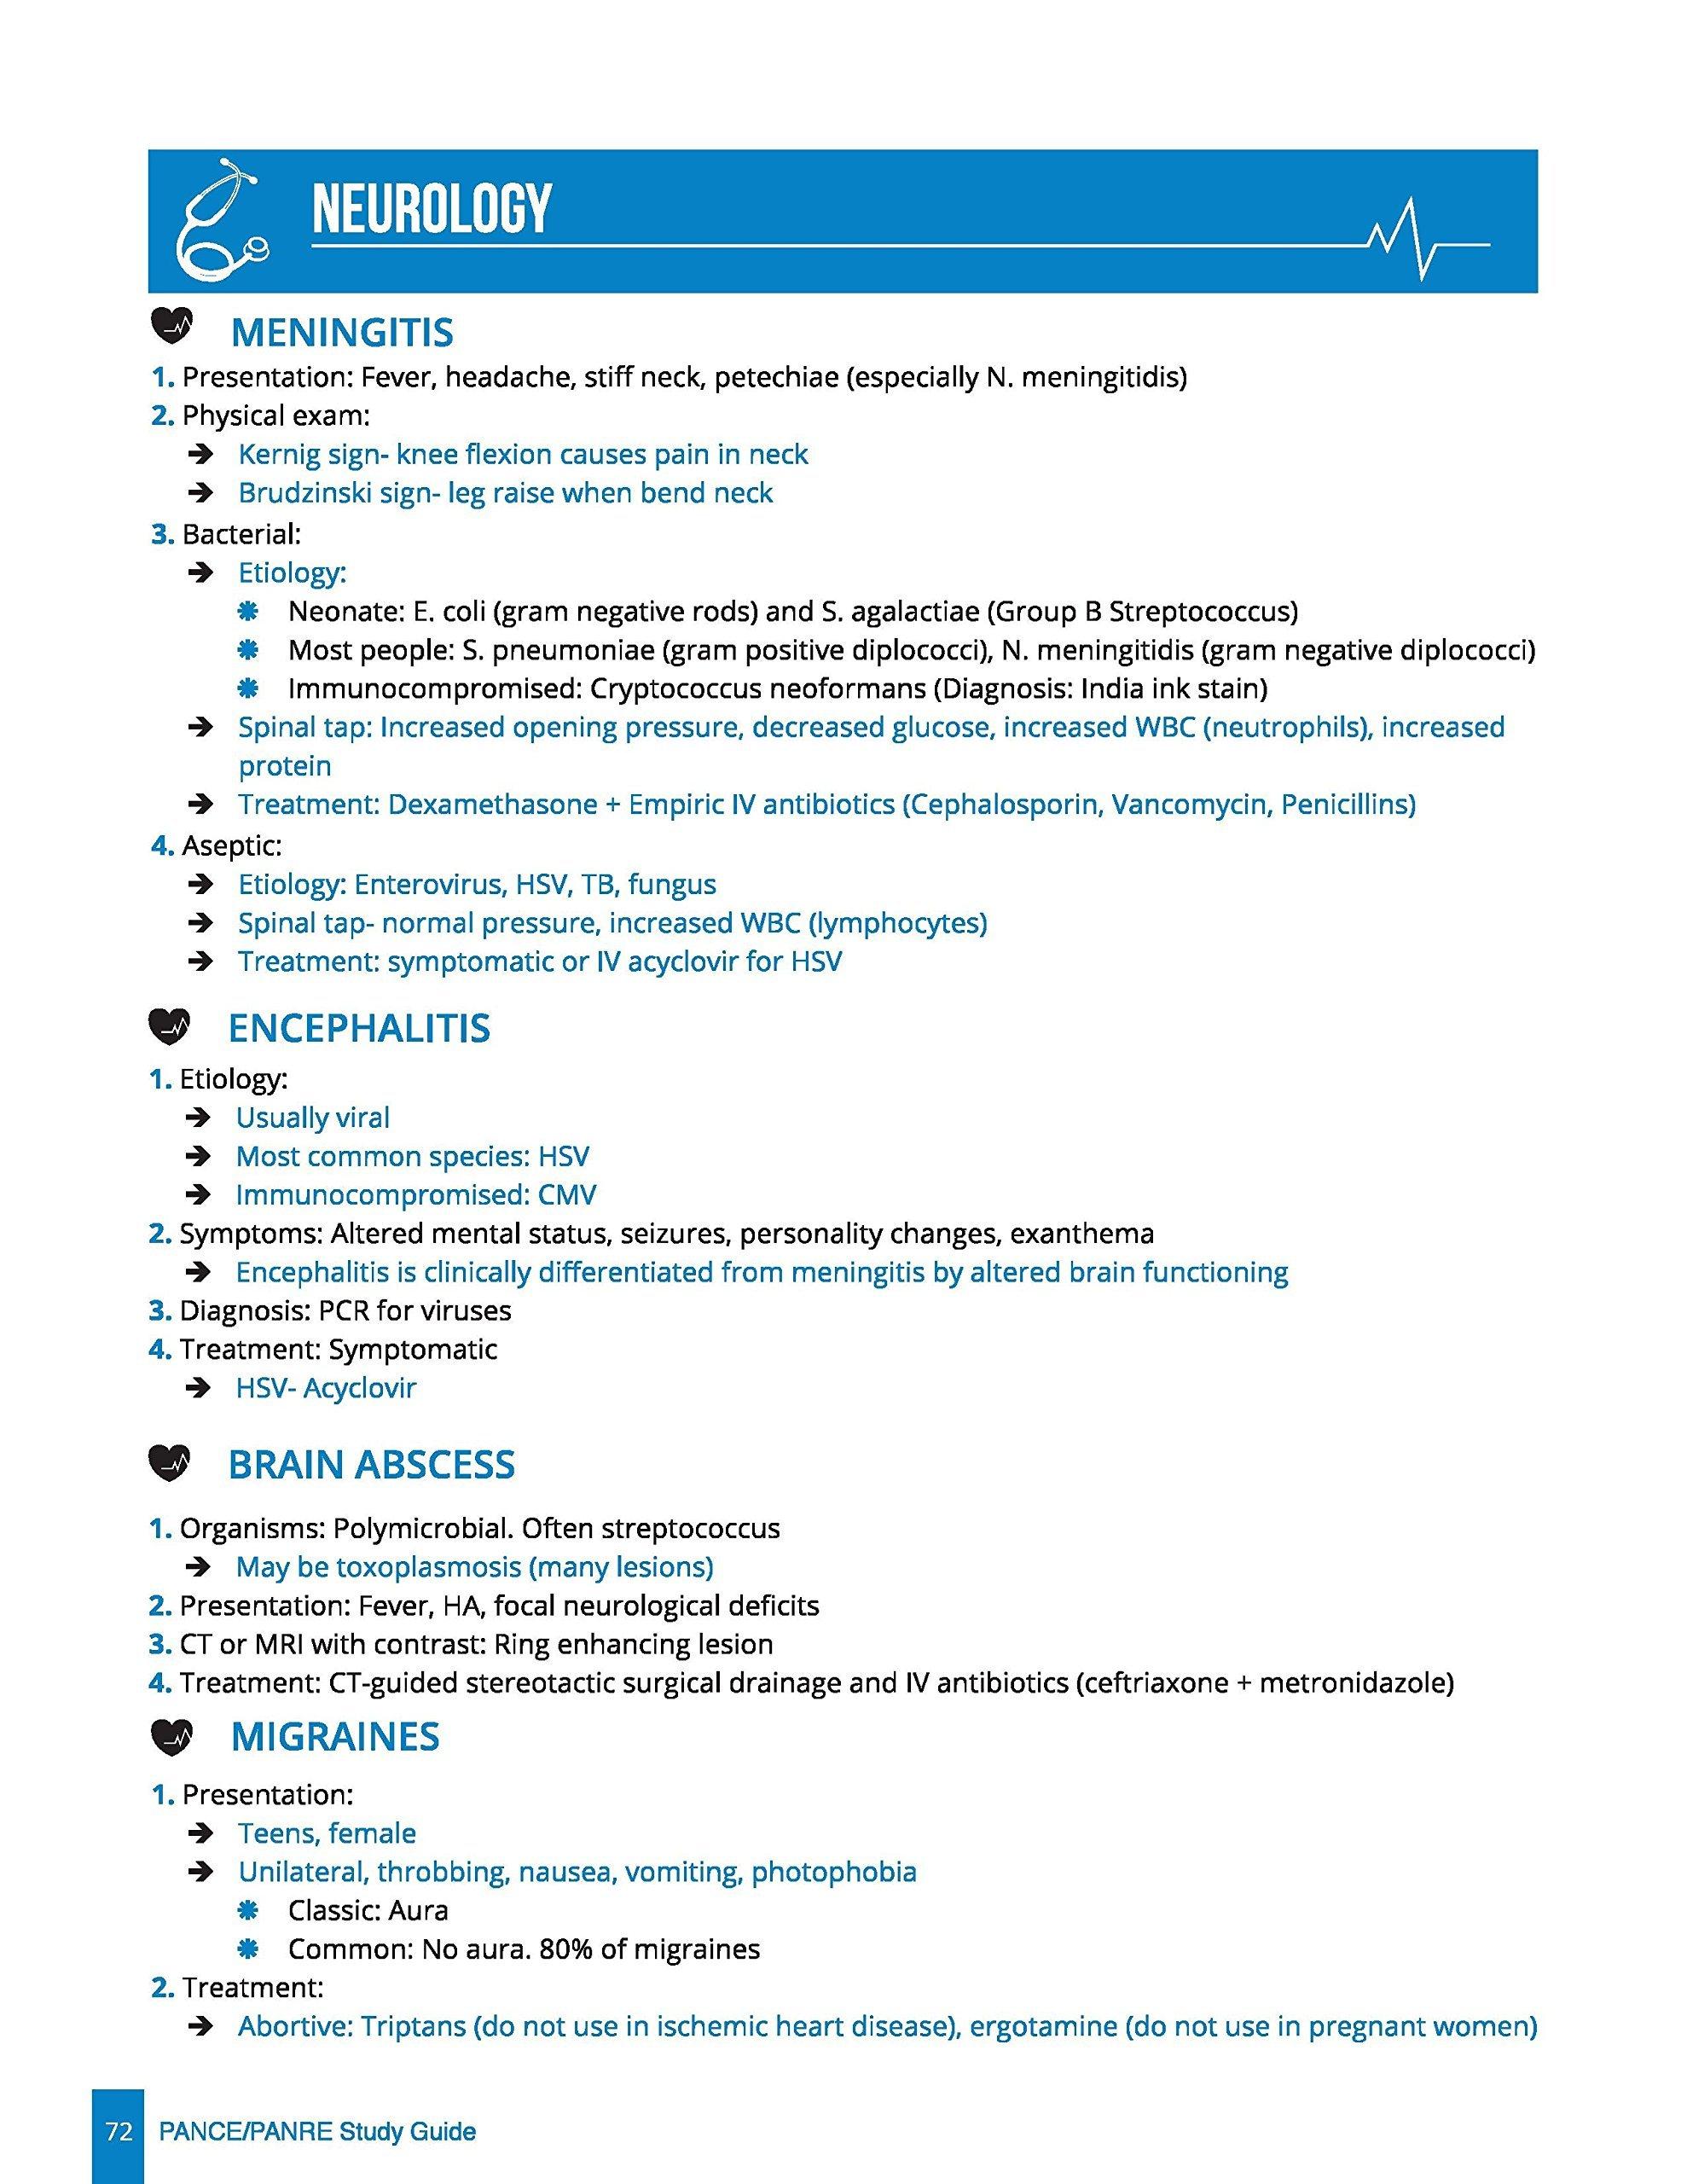 Pancepanre study guide lauren russo 9781364408626 amazon books malvernweather Images